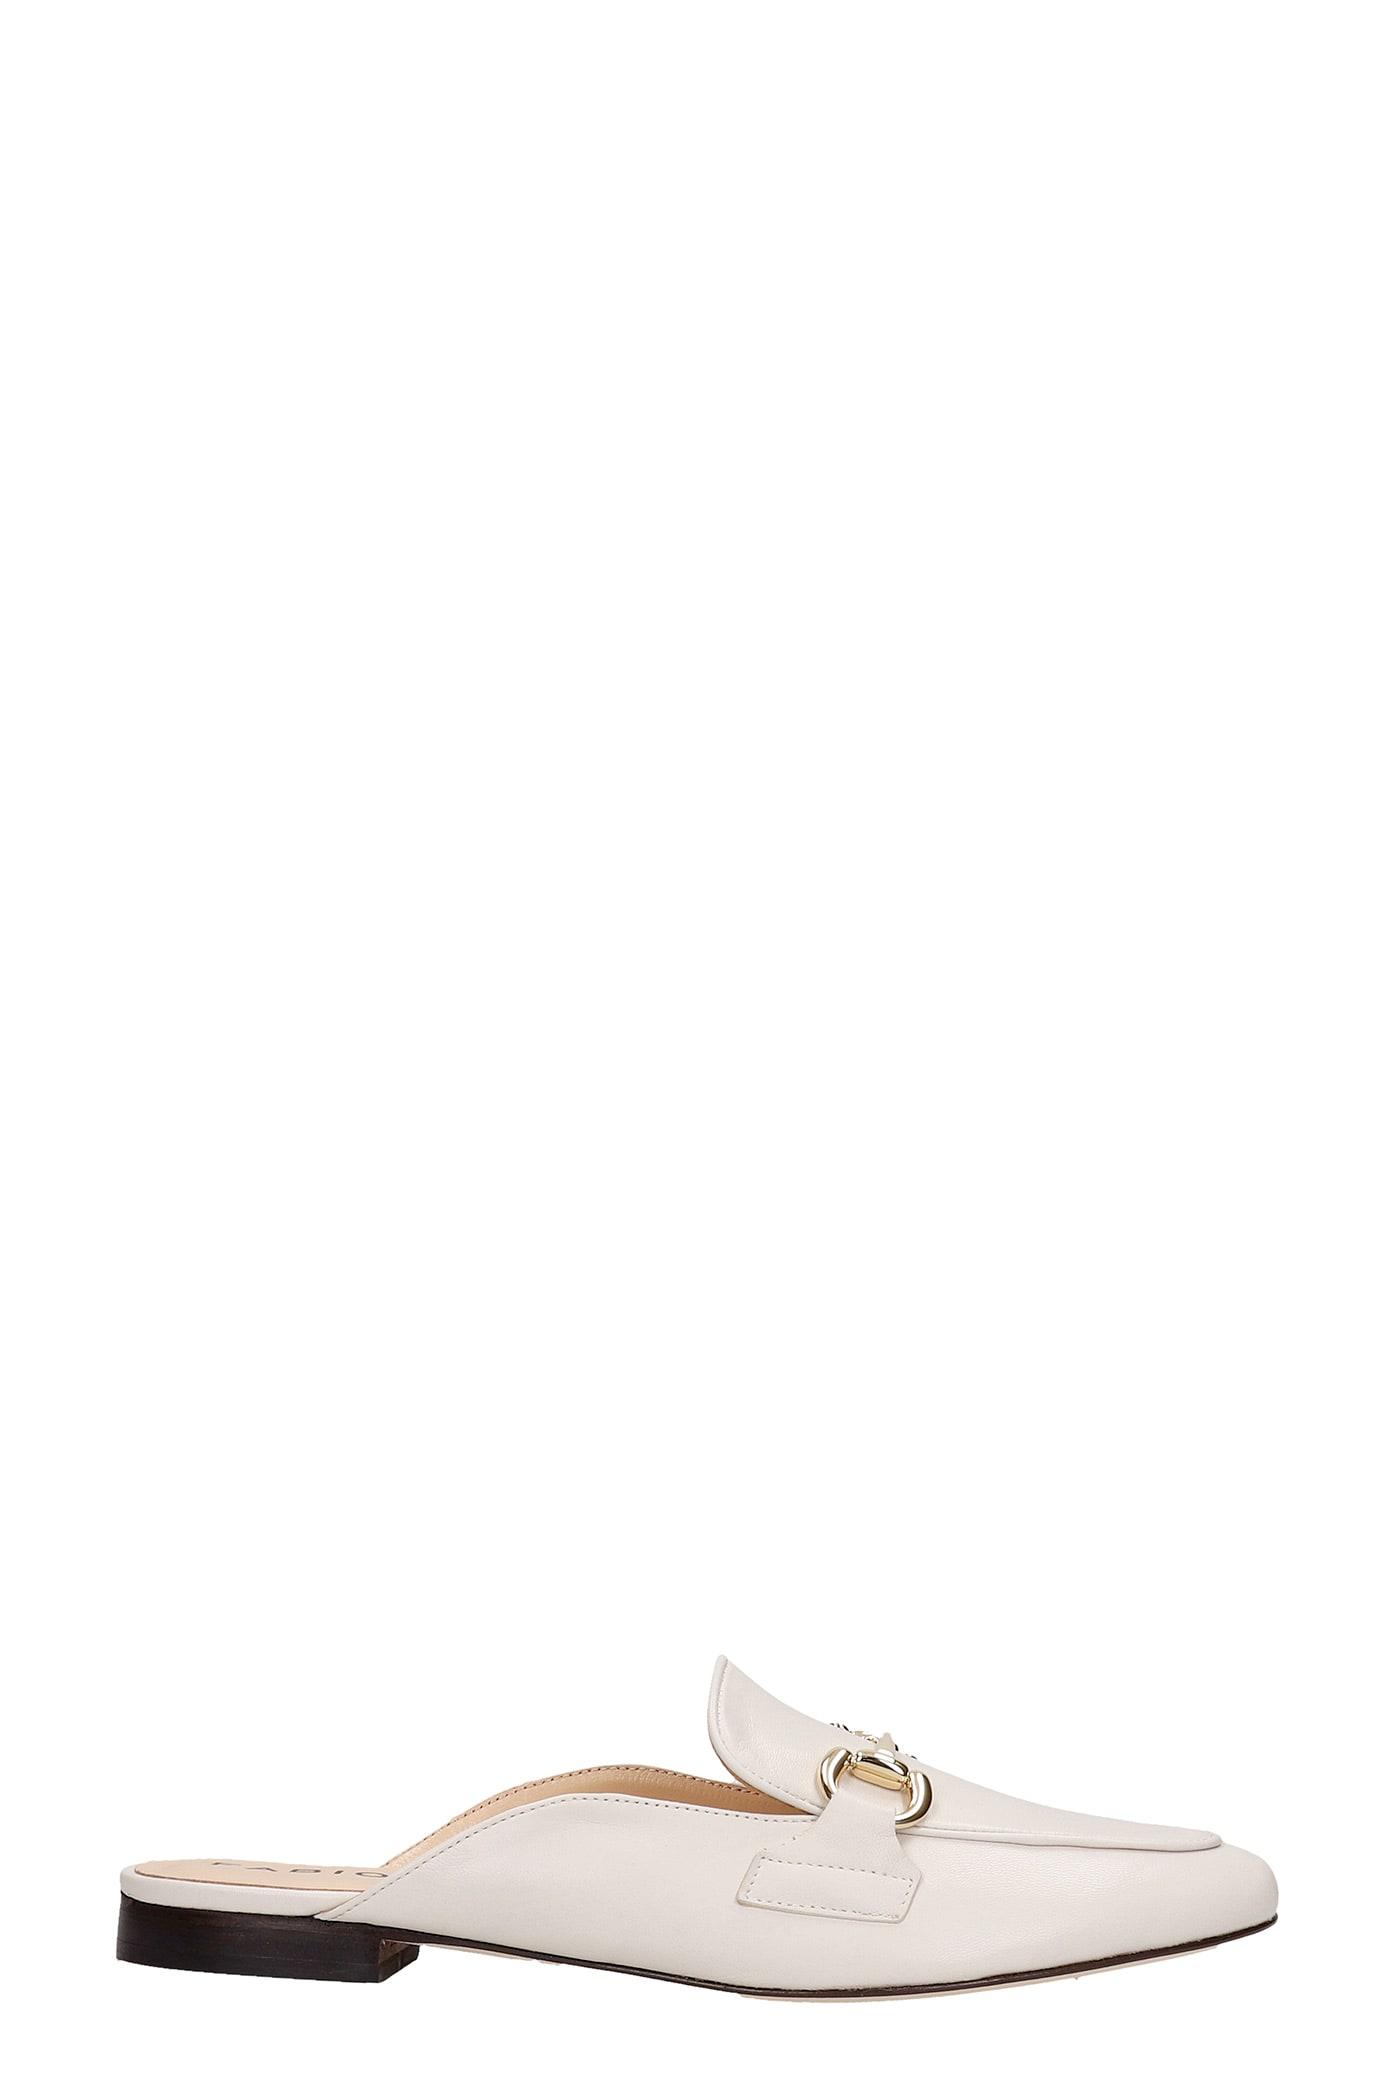 Fabio Rusconi Loafers In Beige Leather